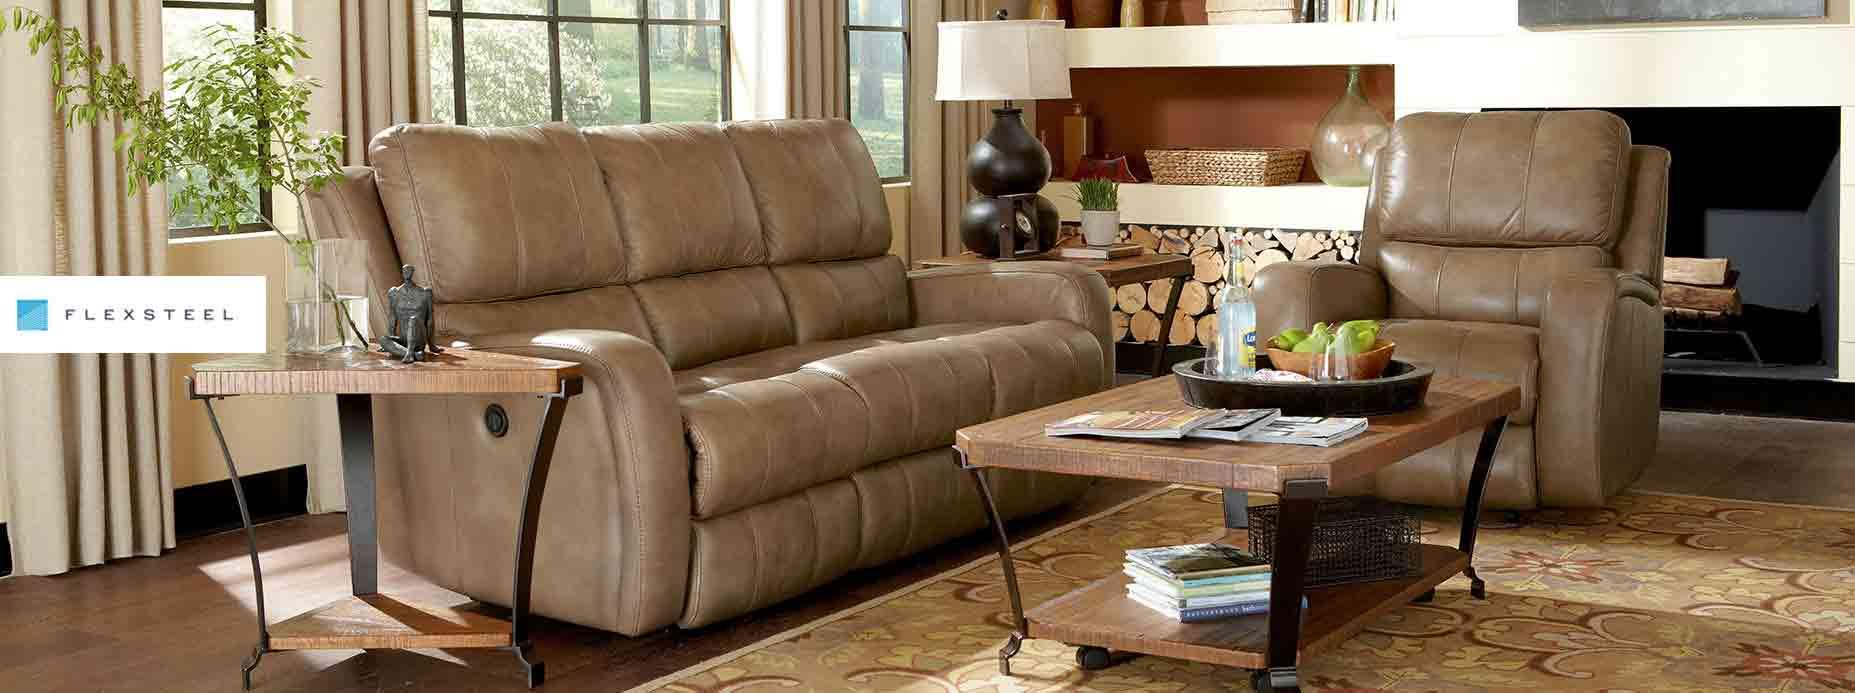 North Carolina Discount Furniture Stores Offer Brand Name